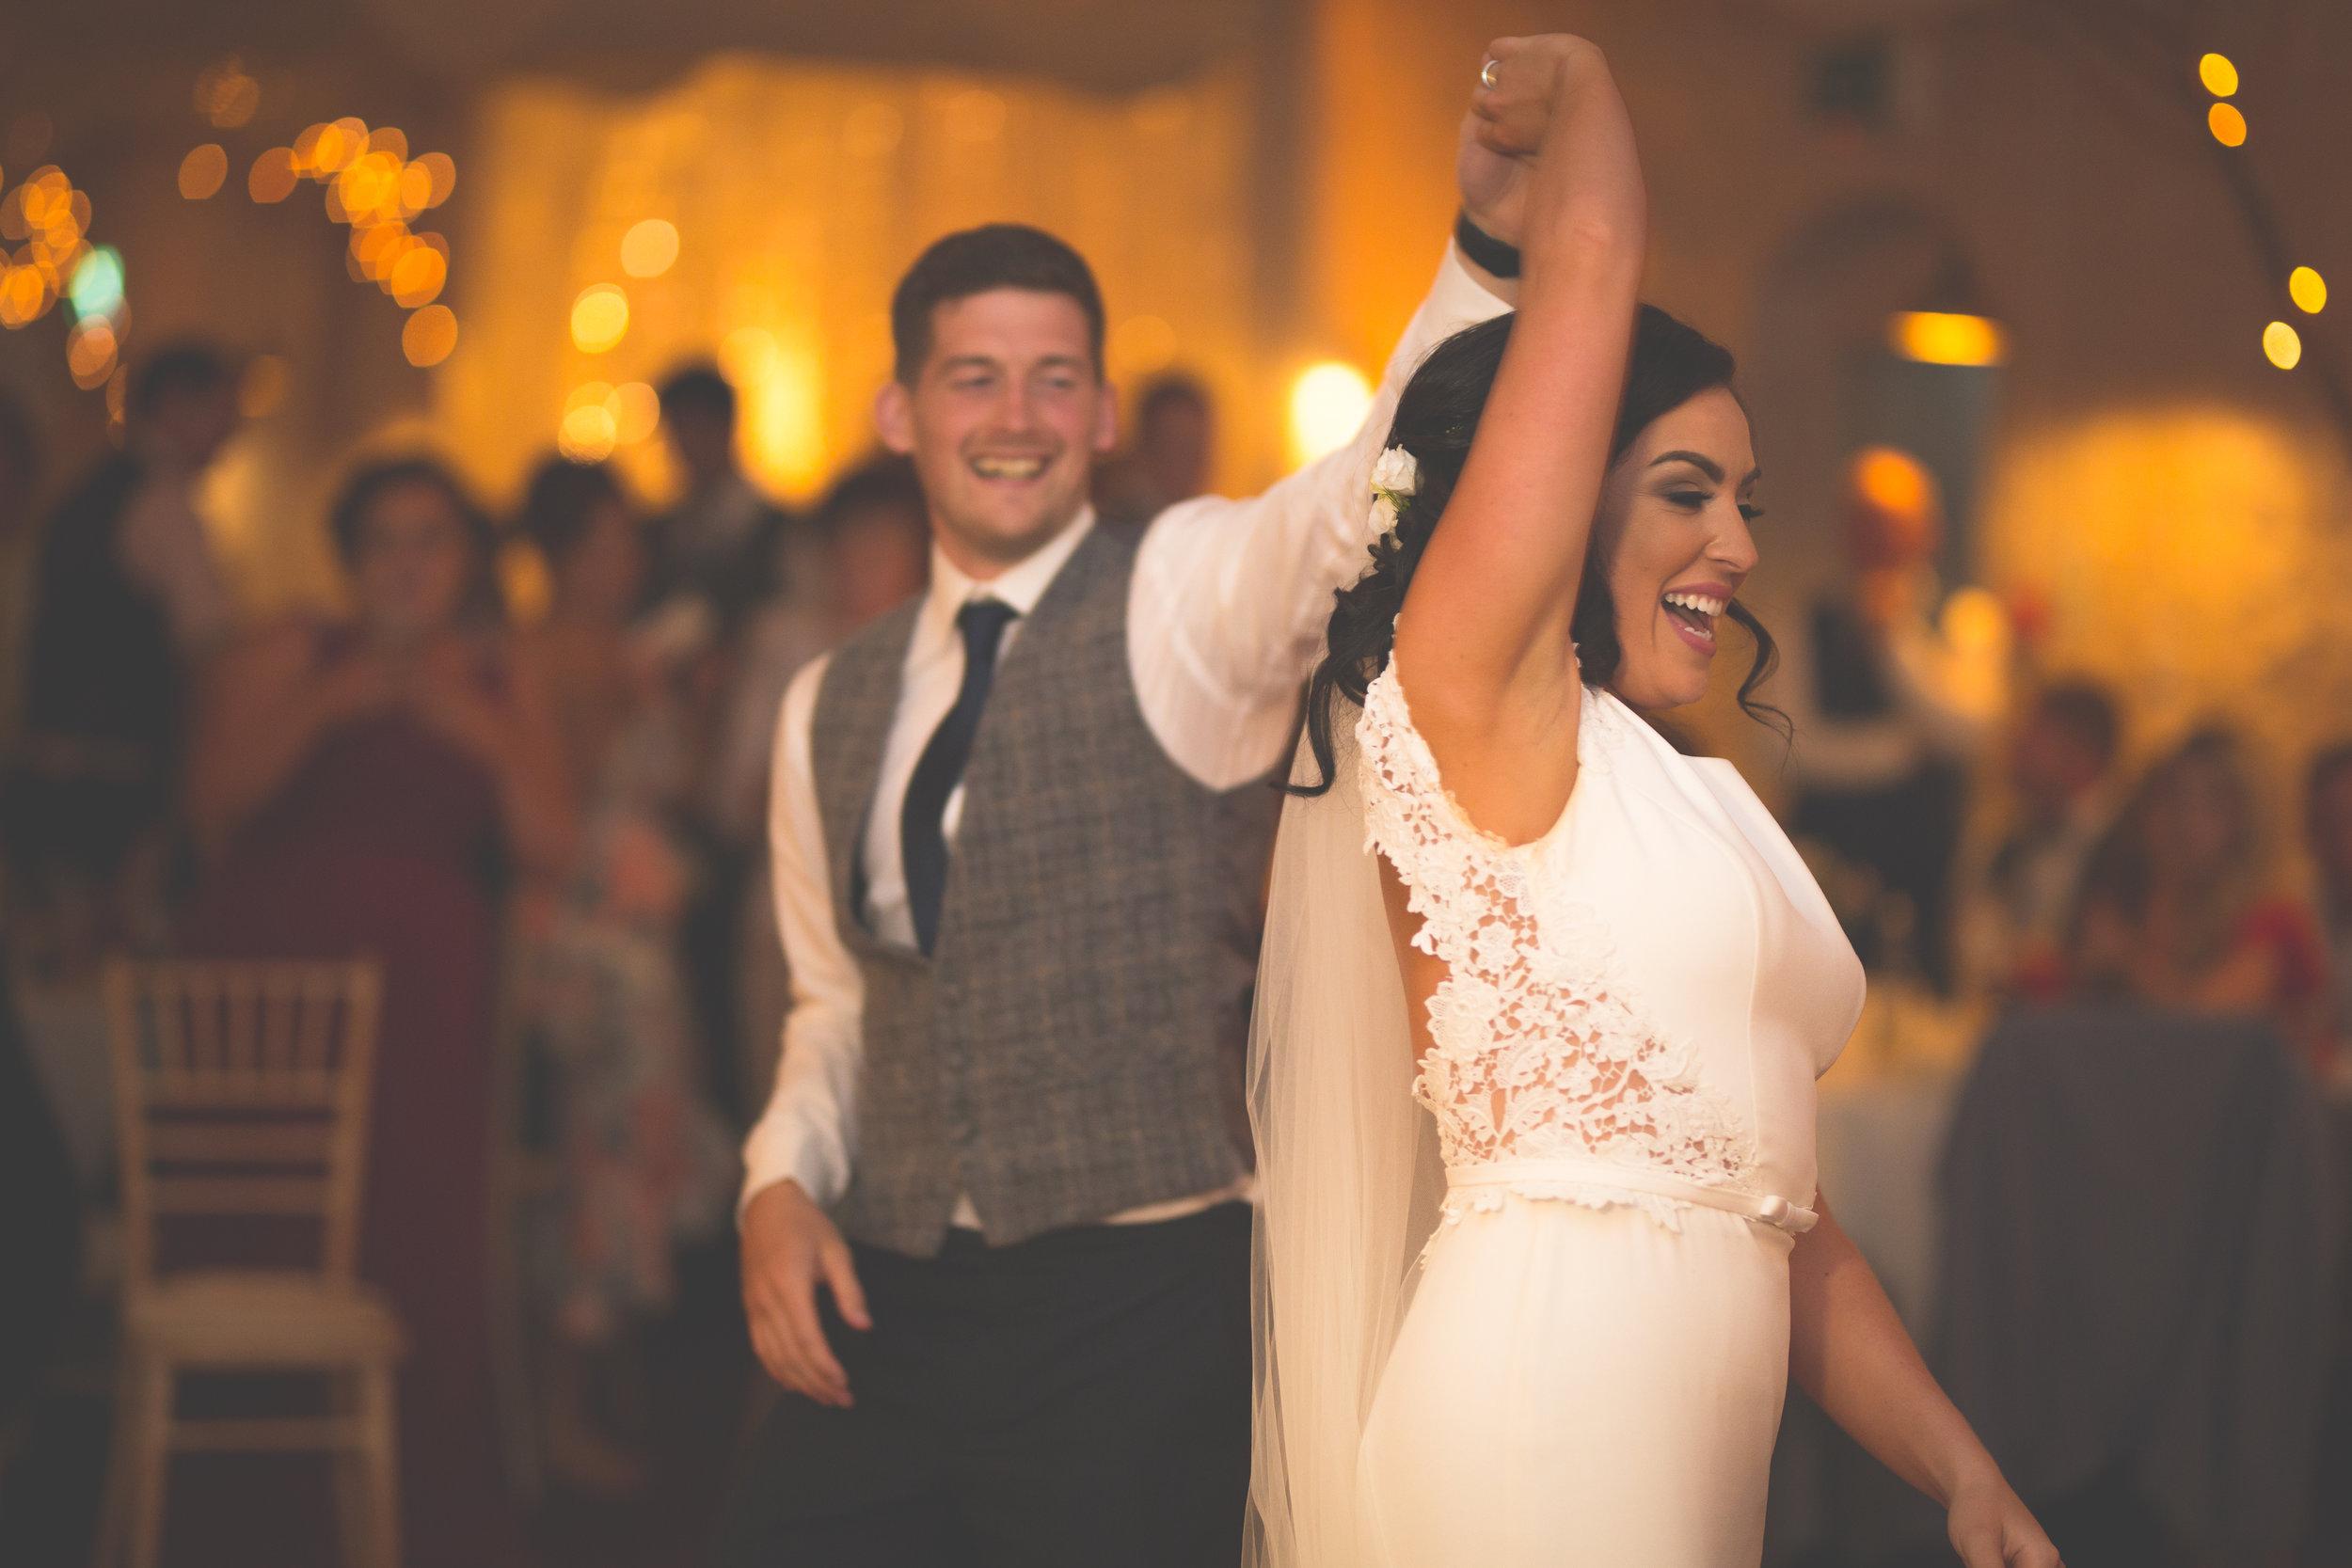 Brian McEwan Wedding Photography | Carol-Annee & Sean | The Dancing-24.jpg